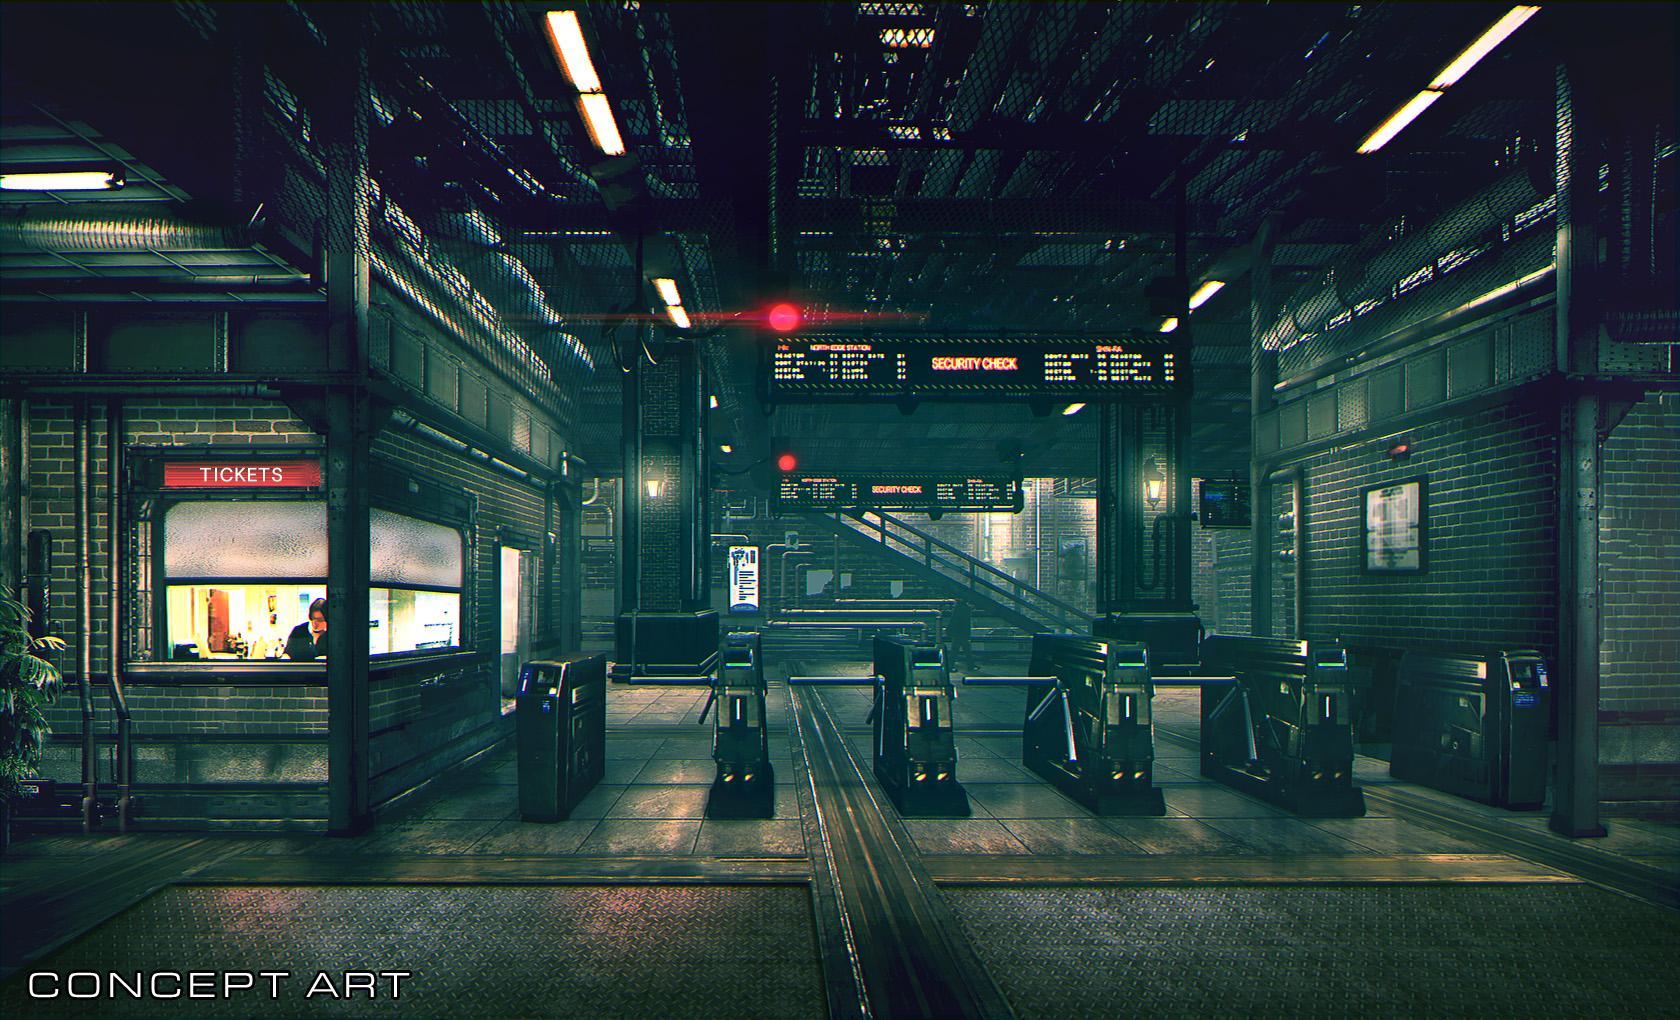 Final-Fantasy-VII-Remake_07-23-19_001.jpg